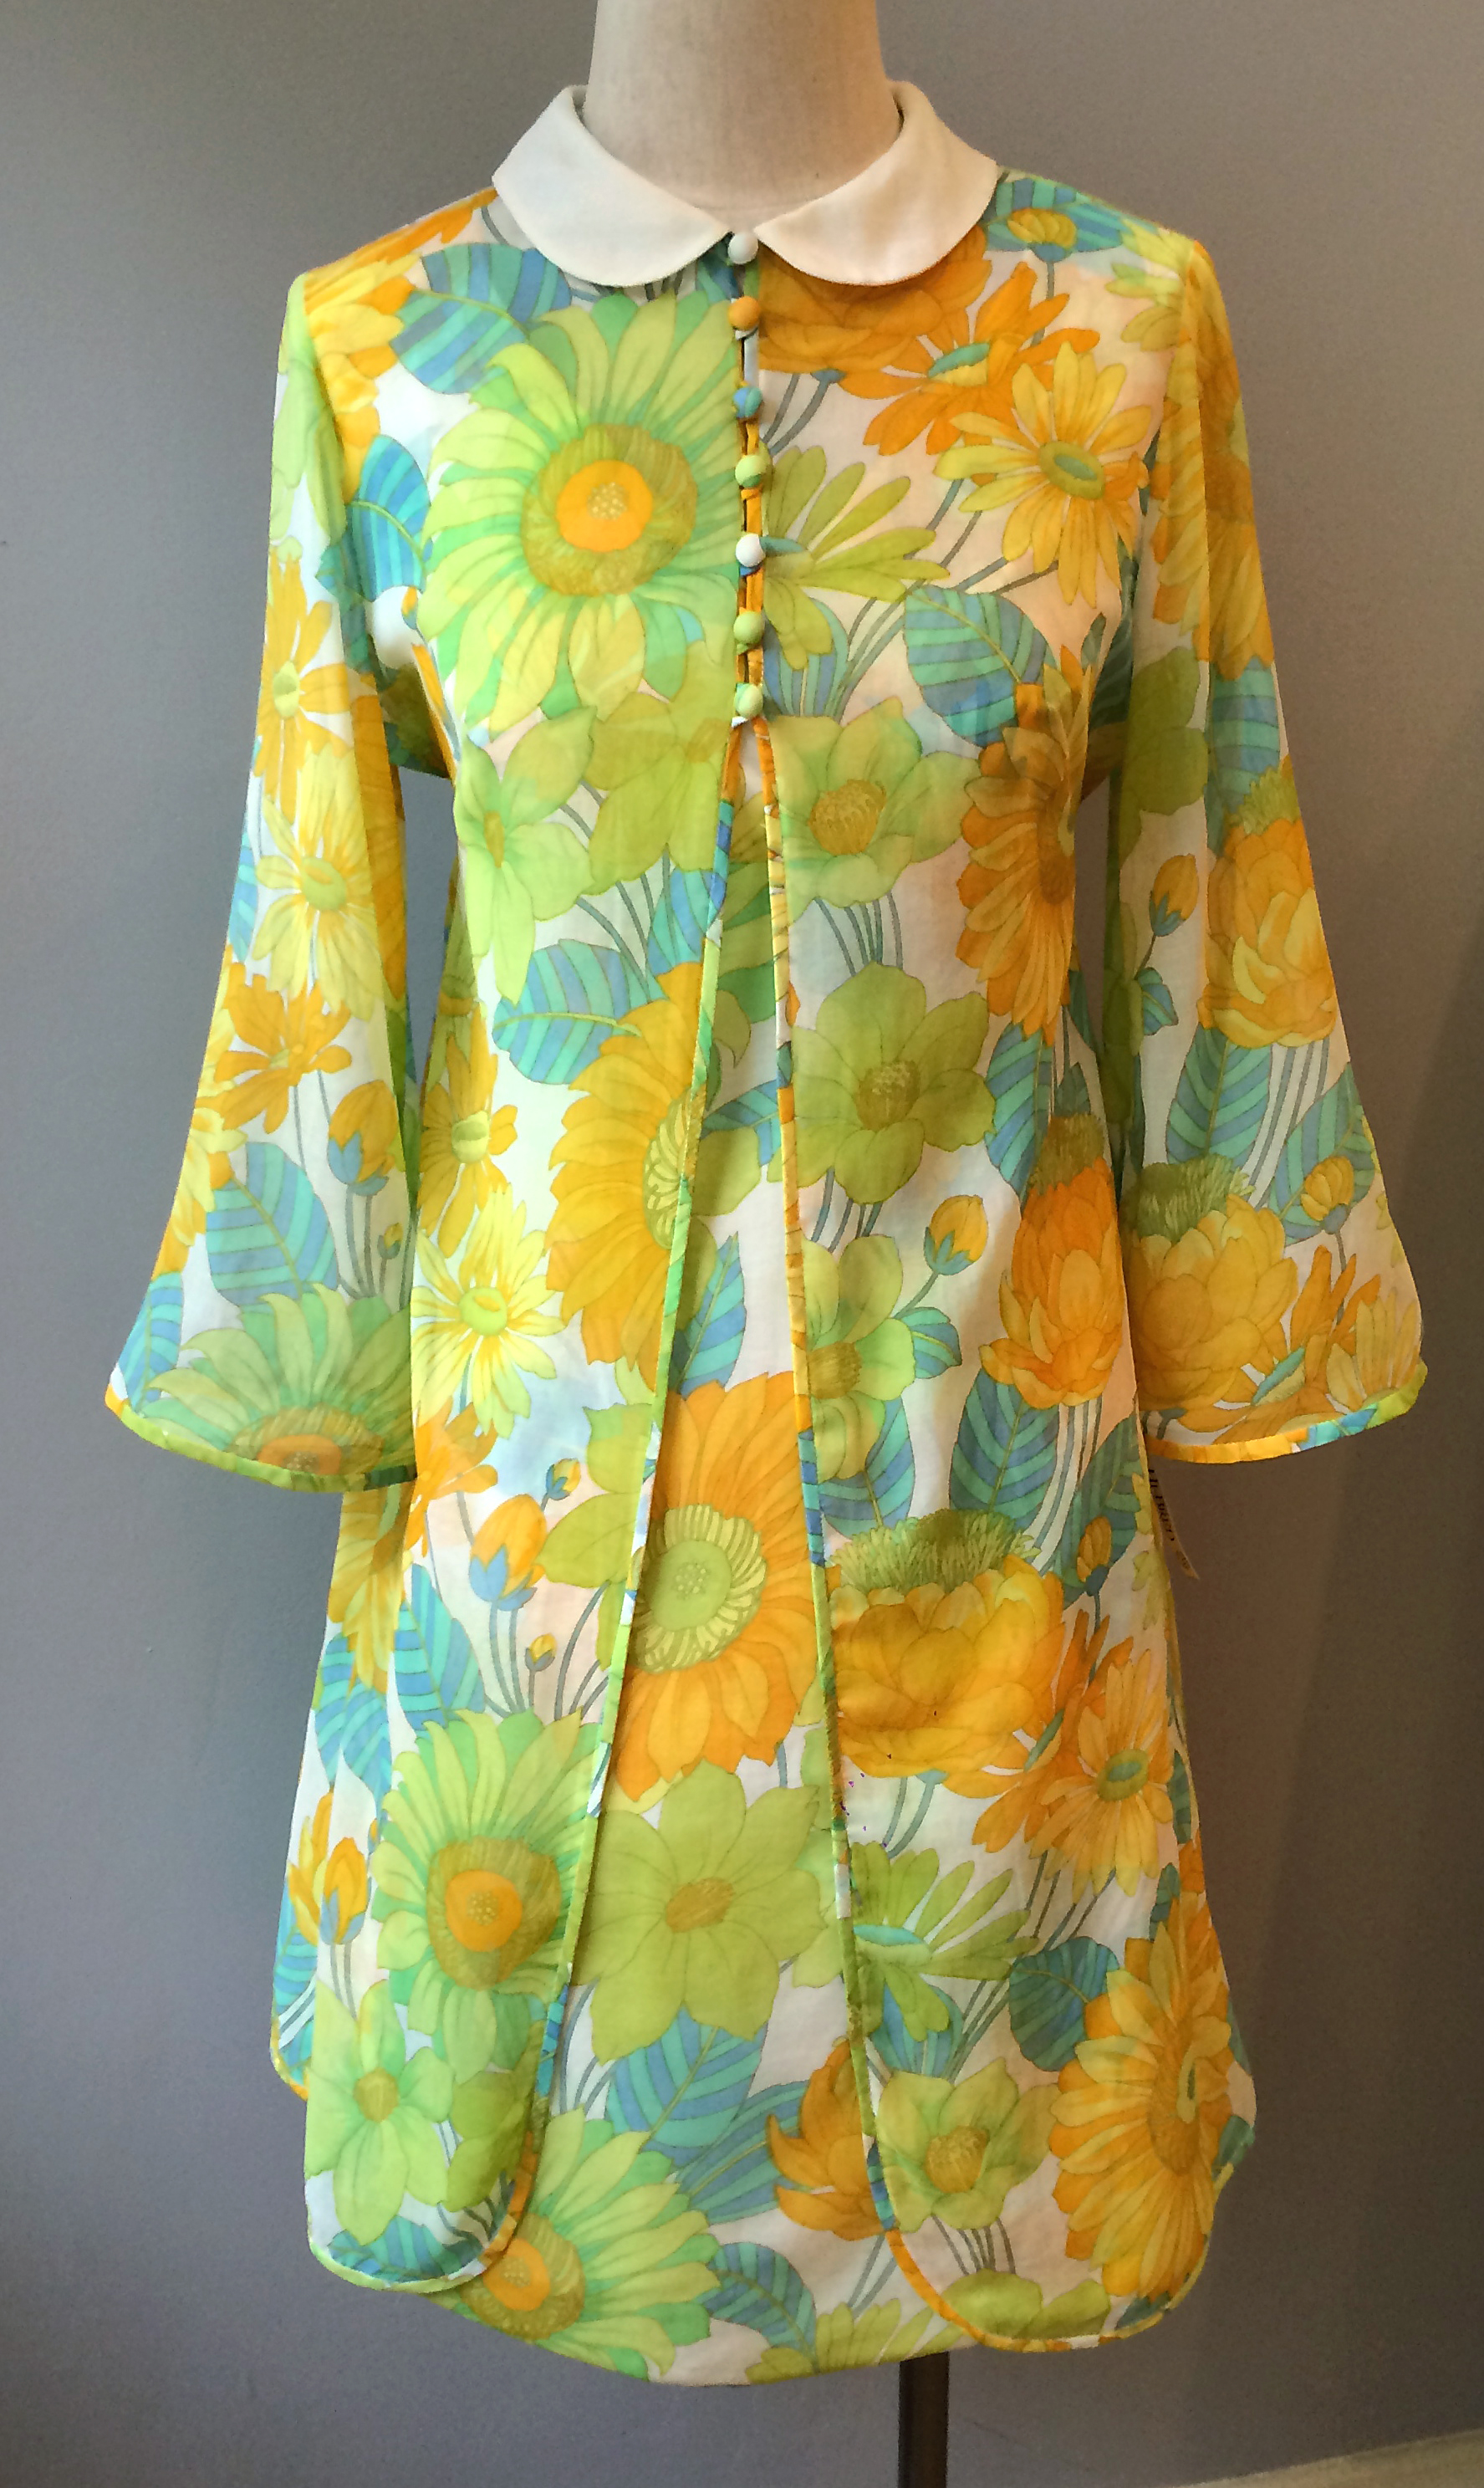 yellowflowereddoubledress.jpg